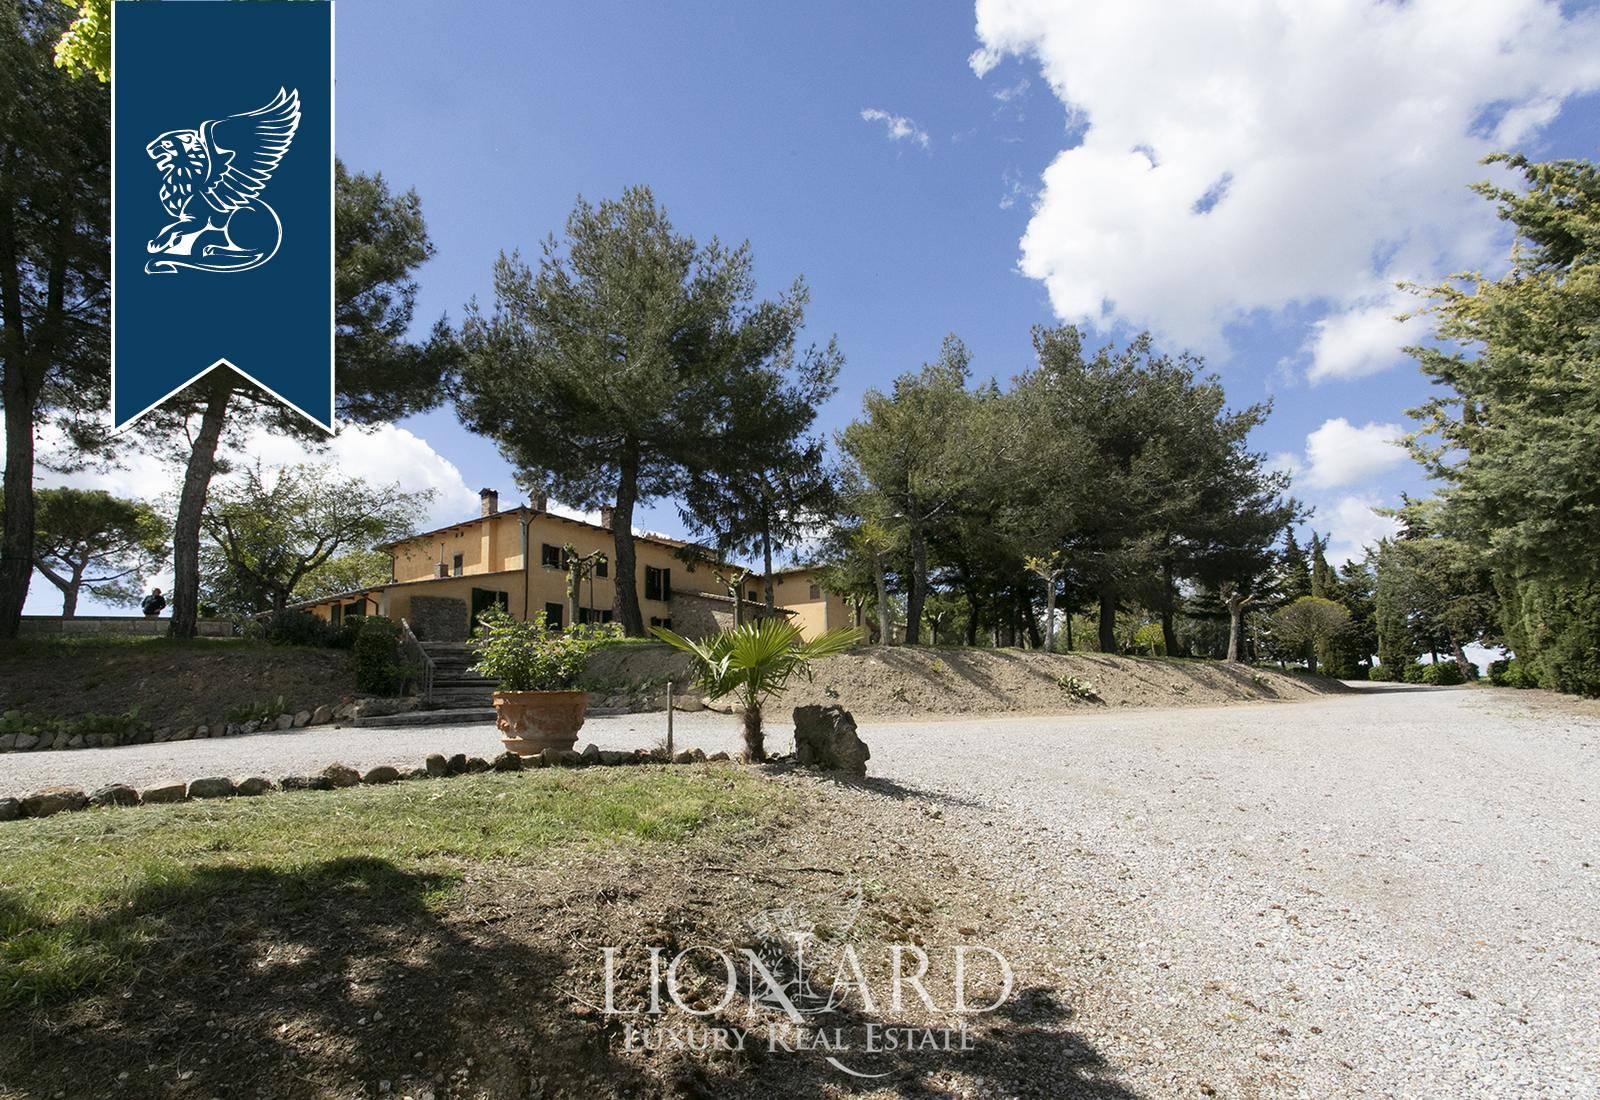 Agriturismo in Vendita a Montepulciano: 0 locali, 700 mq - Foto 5